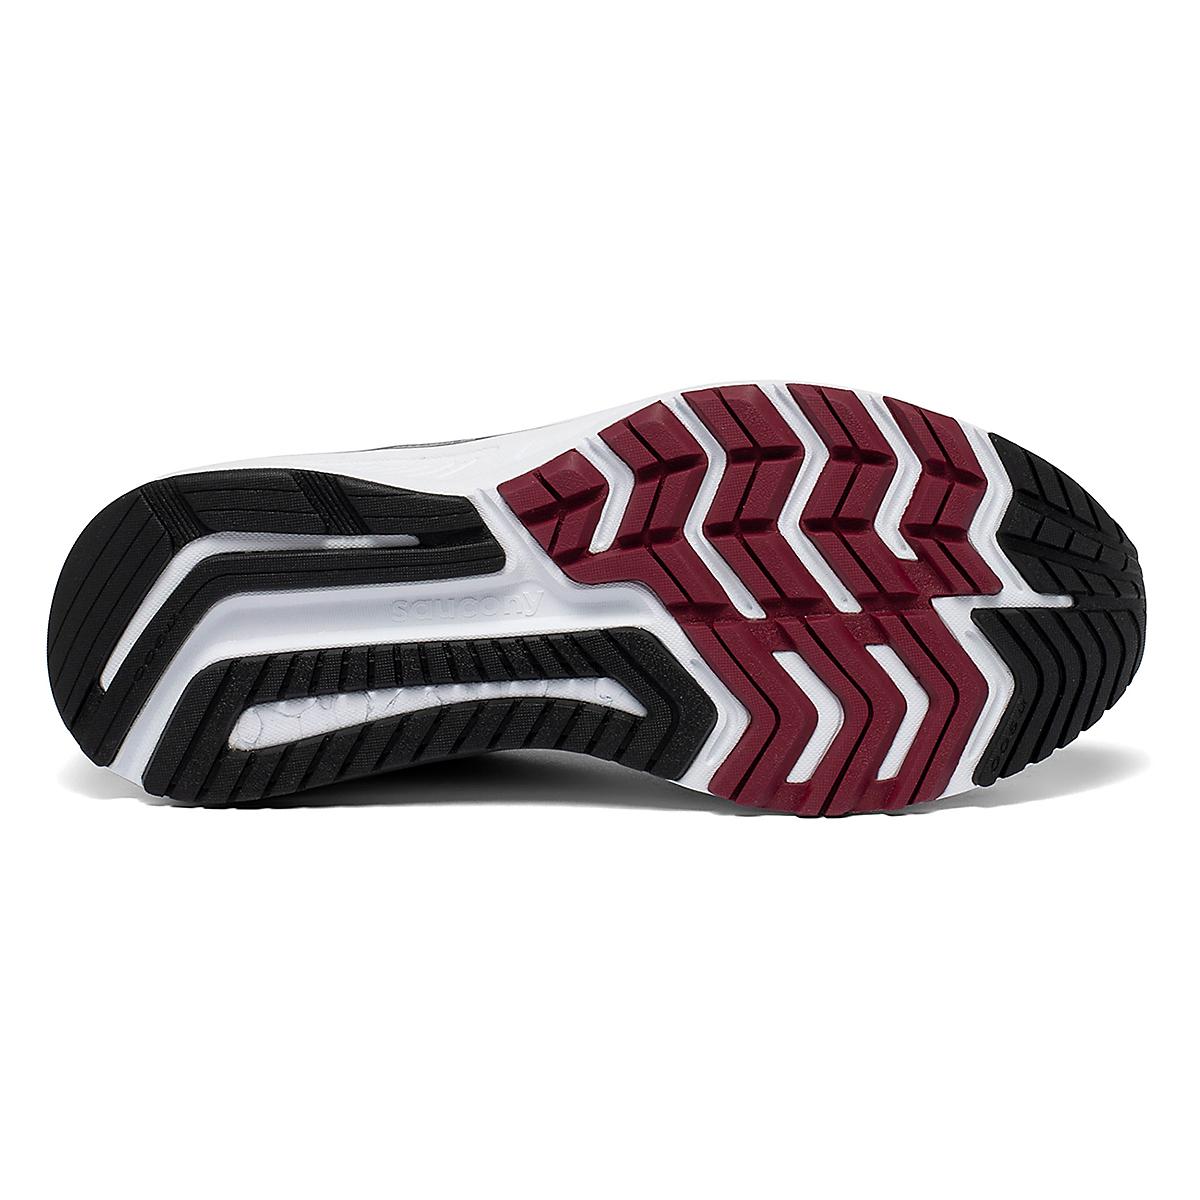 Men's Saucony Omni 19 Walking Shoe - Color: Alloy/Brick - Size: 7 - Width: Wide, Alloy/Brick, large, image 4